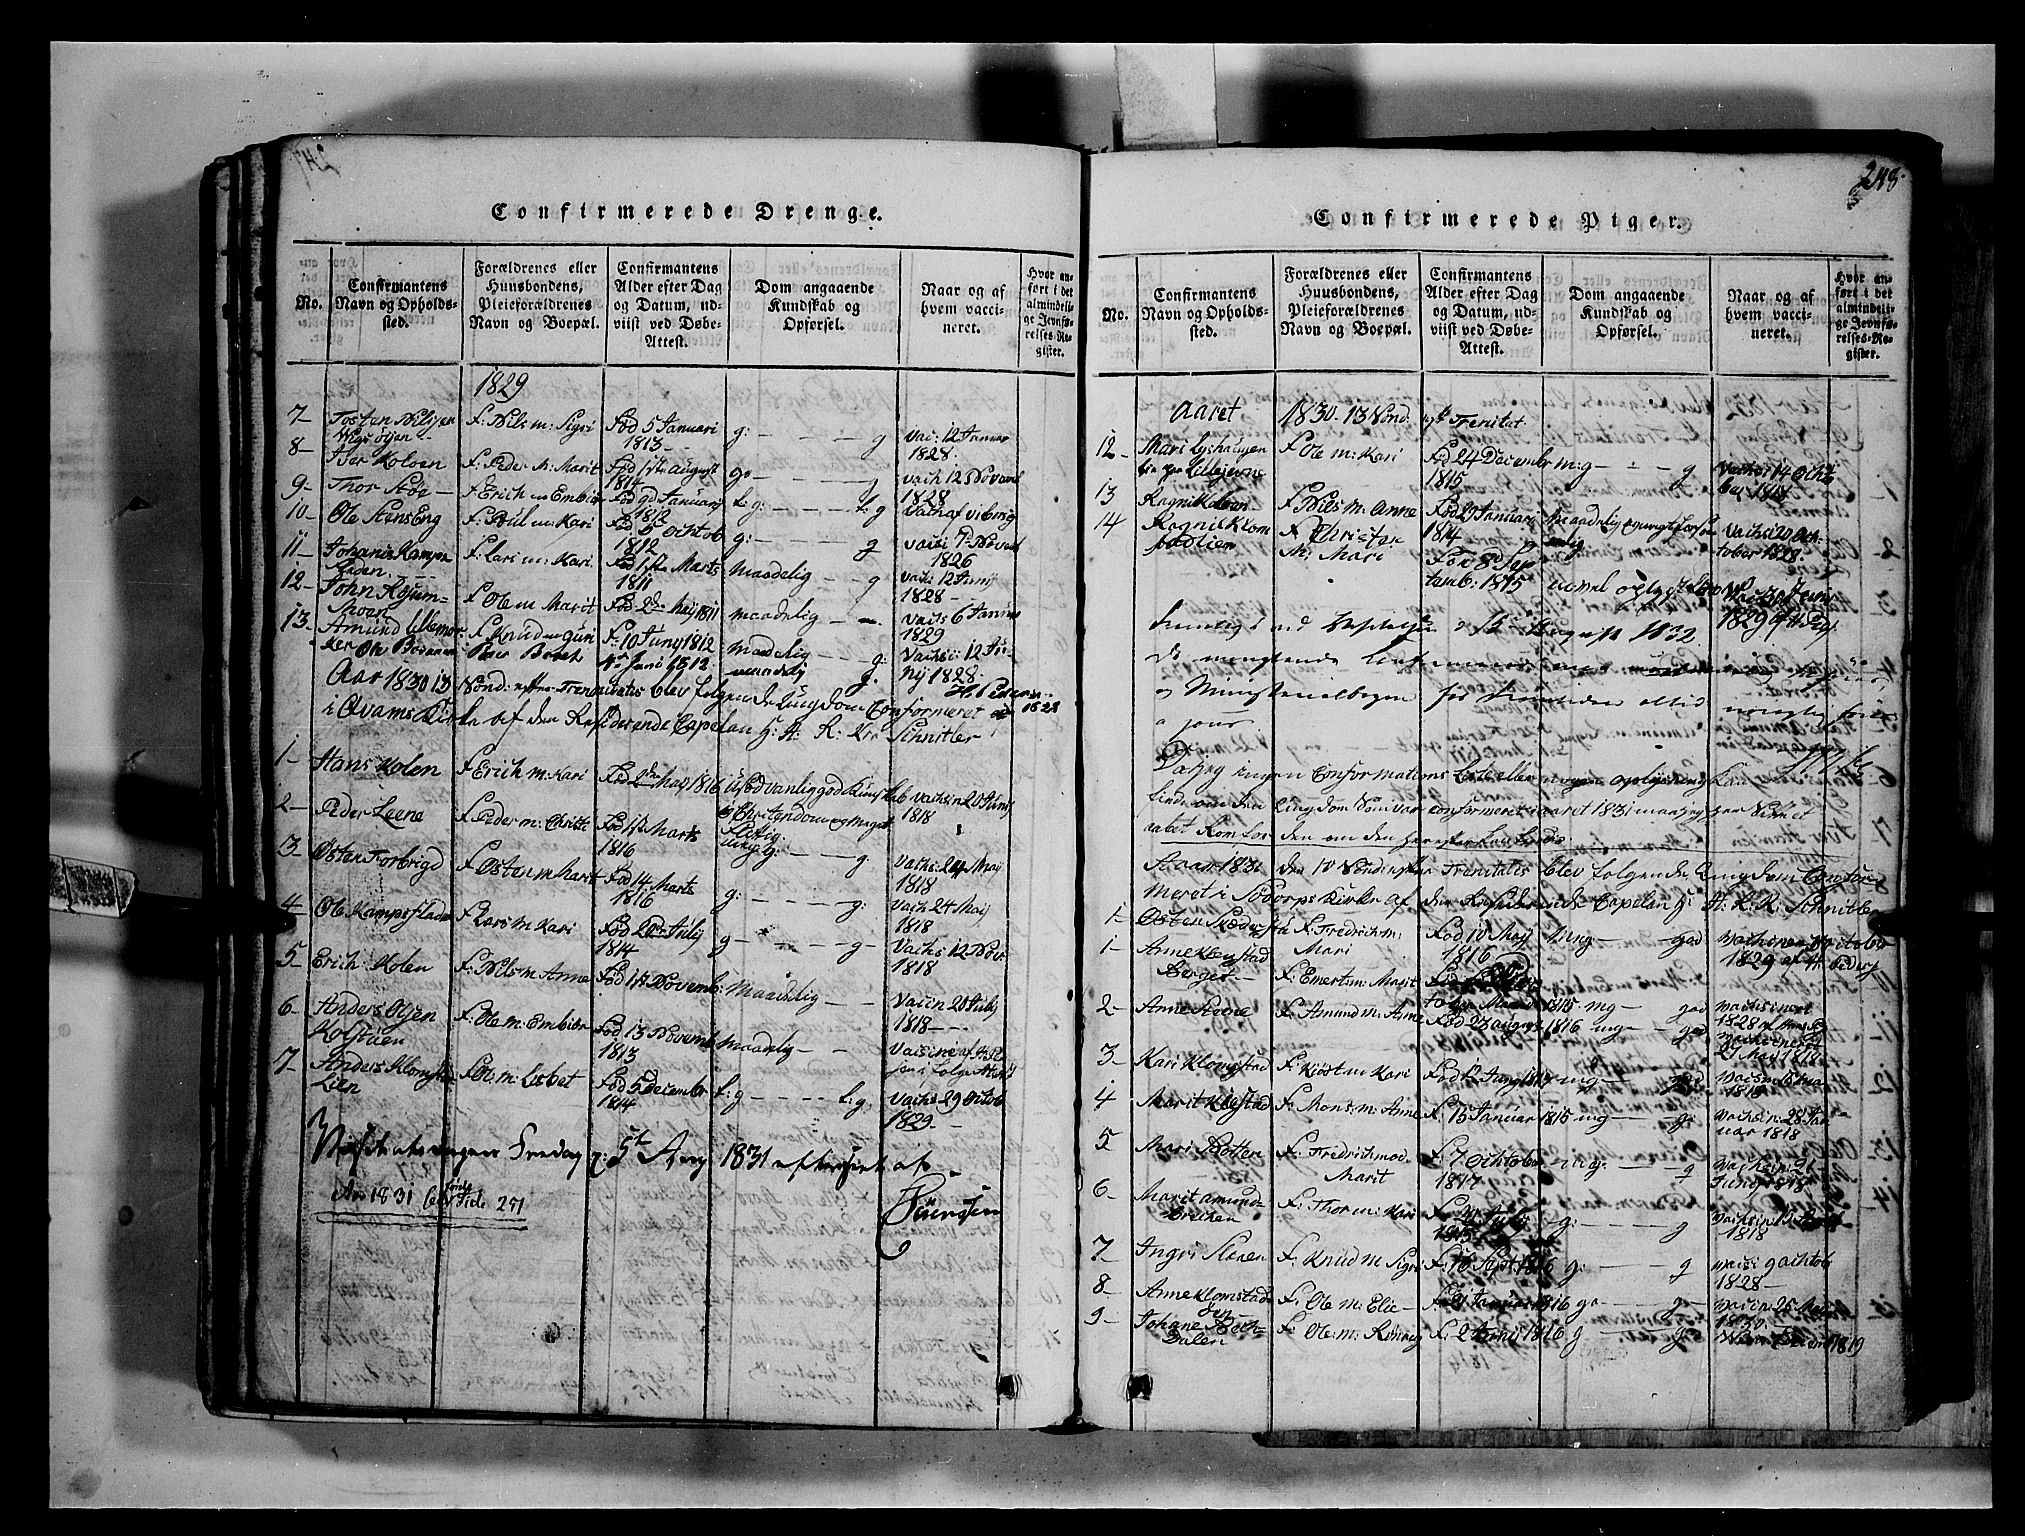 SAH, Fron prestekontor, H/Ha/Hab/L0002: Klokkerbok nr. 2, 1816-1850, s. 248